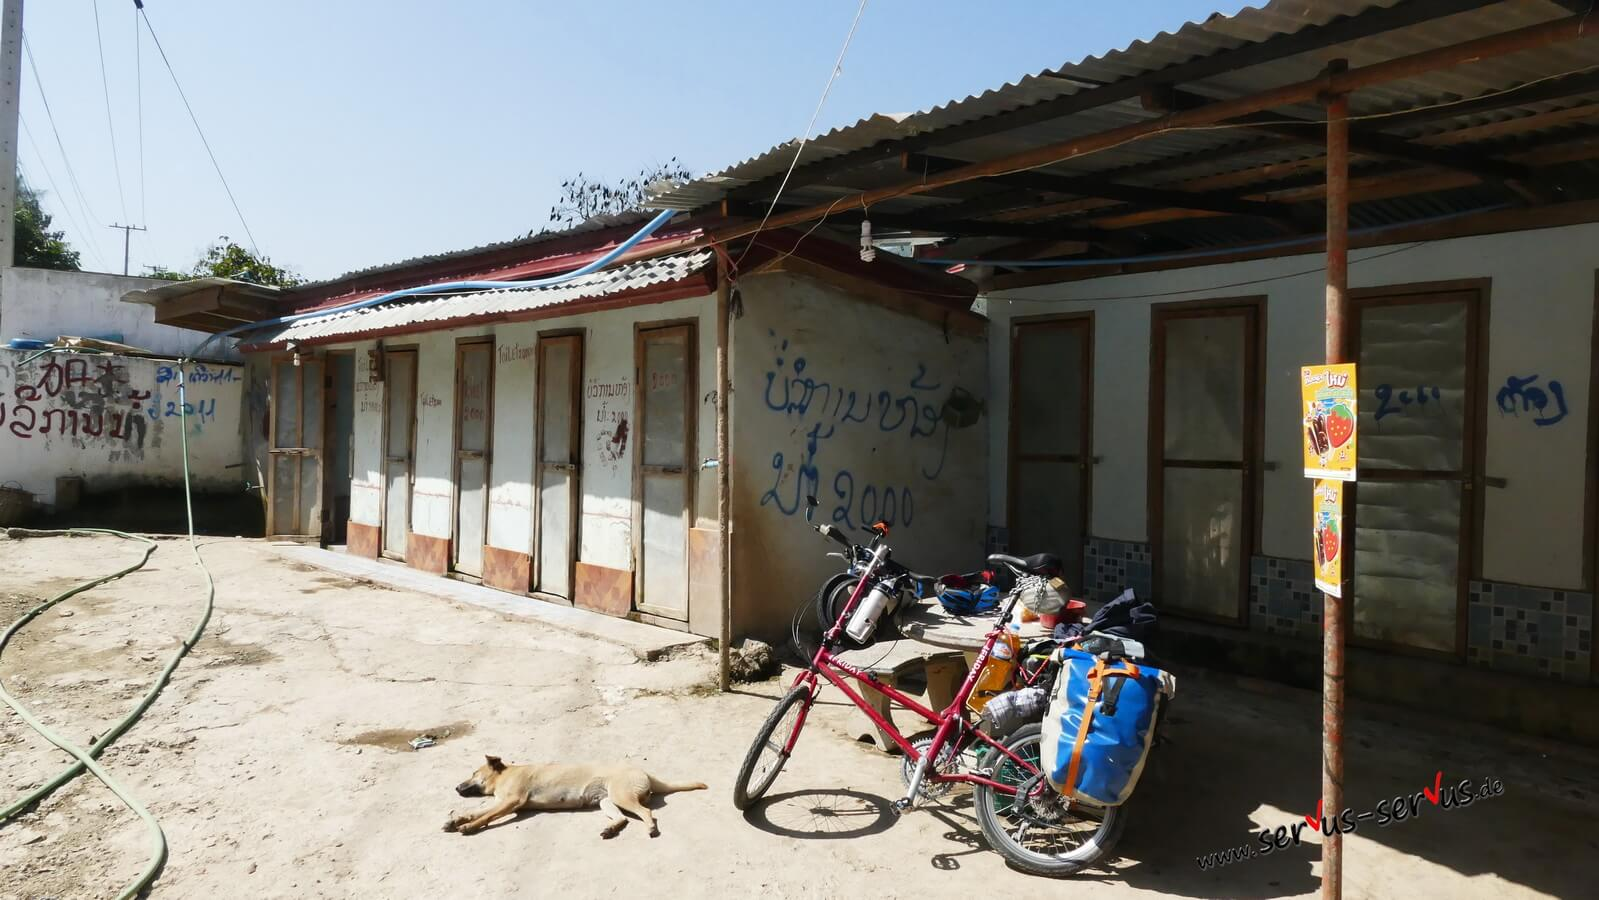 Toilette am Rastplatz in Laos